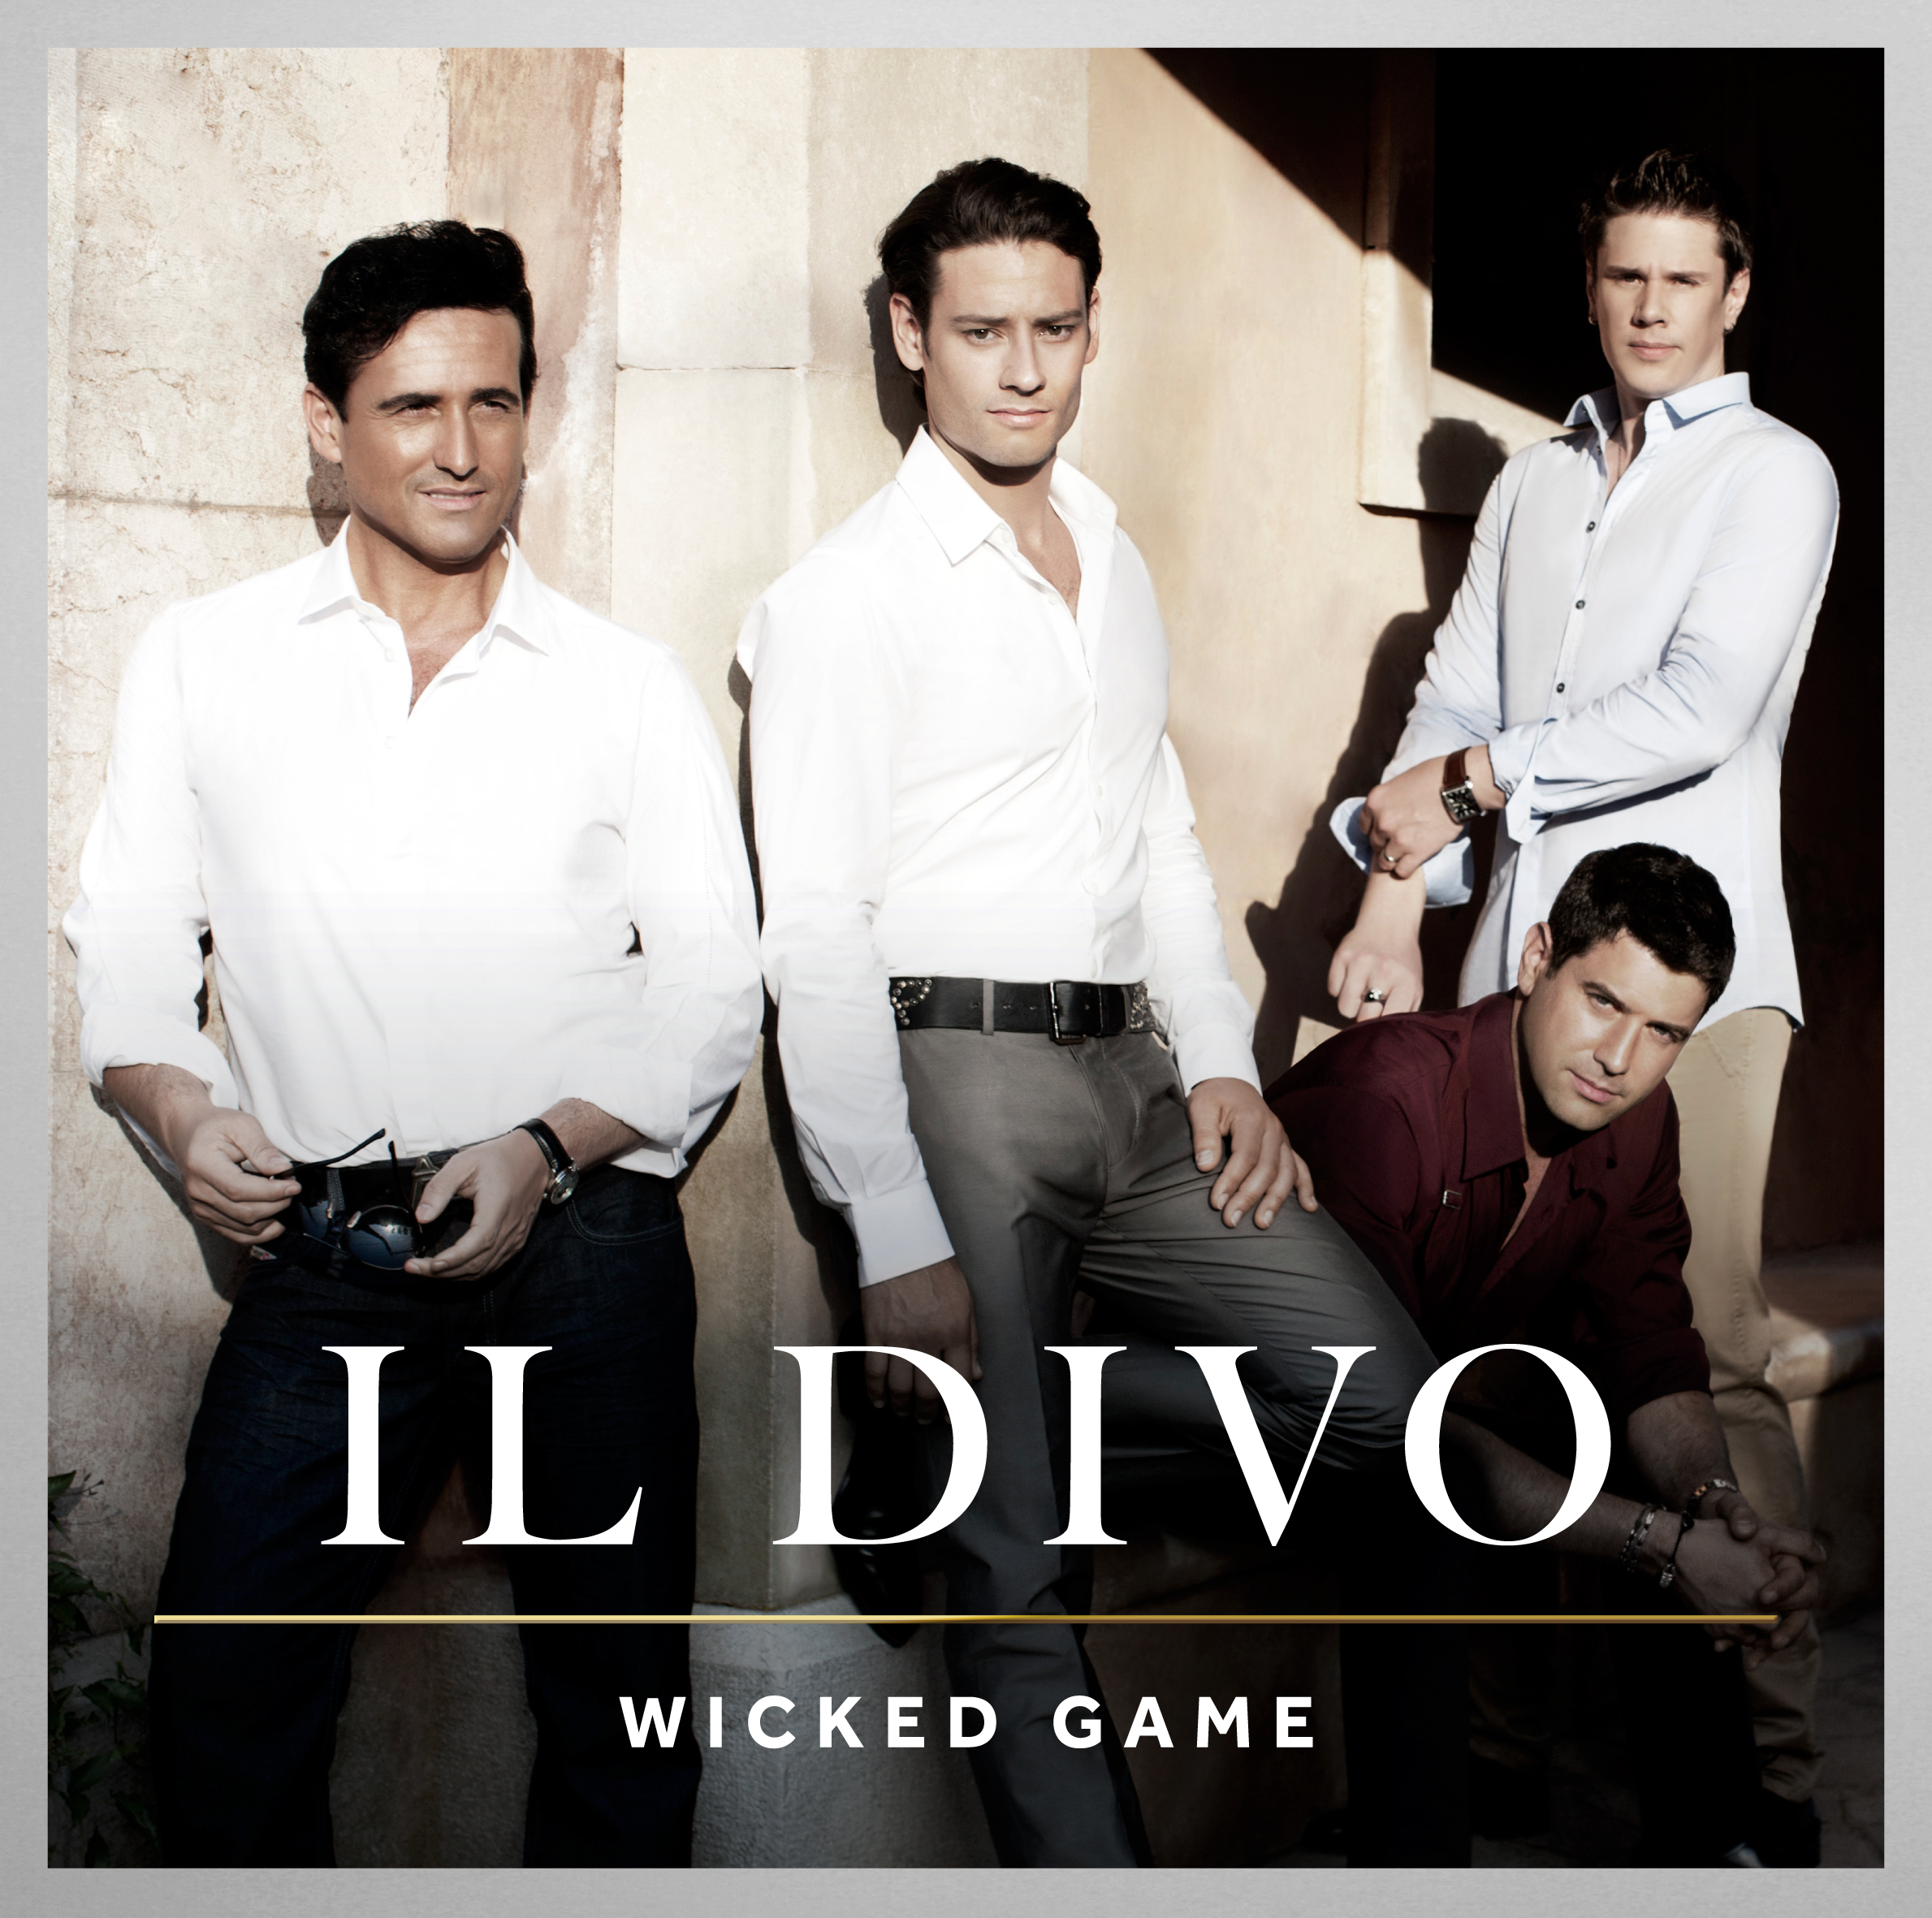 Il divo wiki music story - Il divo amazing grace video ...